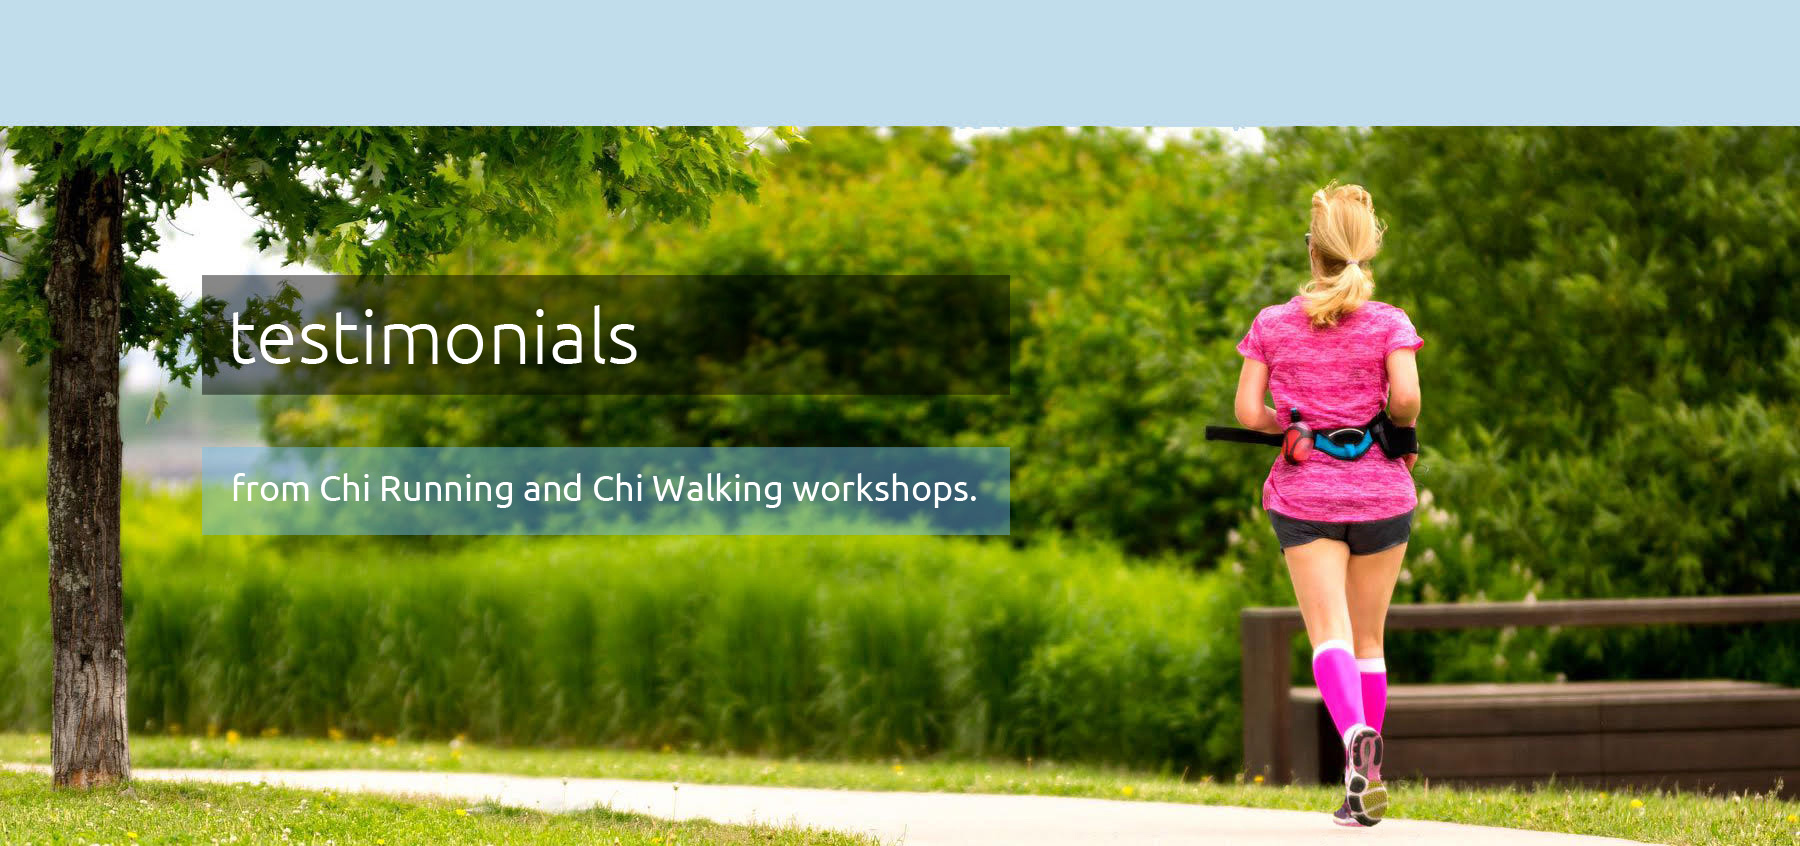 Chi Running and Chi Walking Workshop Testimonials